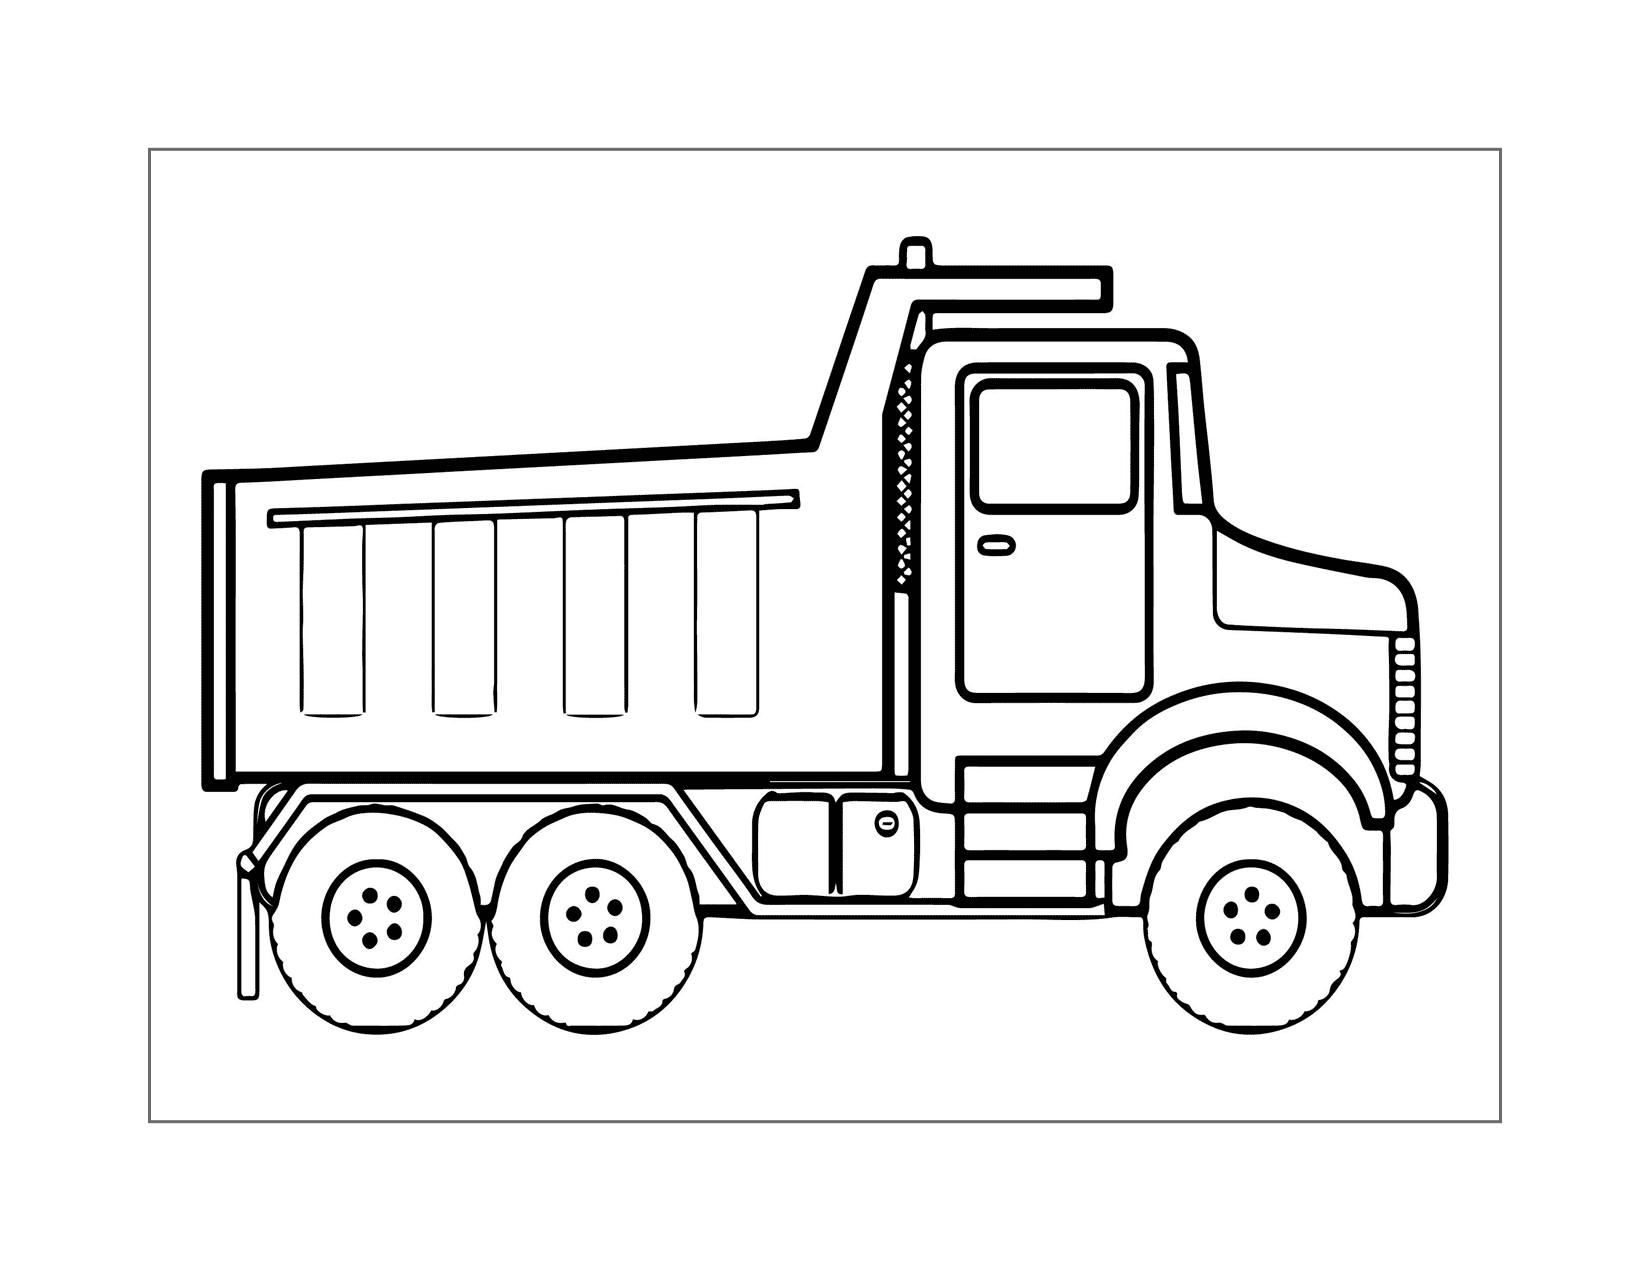 Dump Truck Line Art Coloring Page